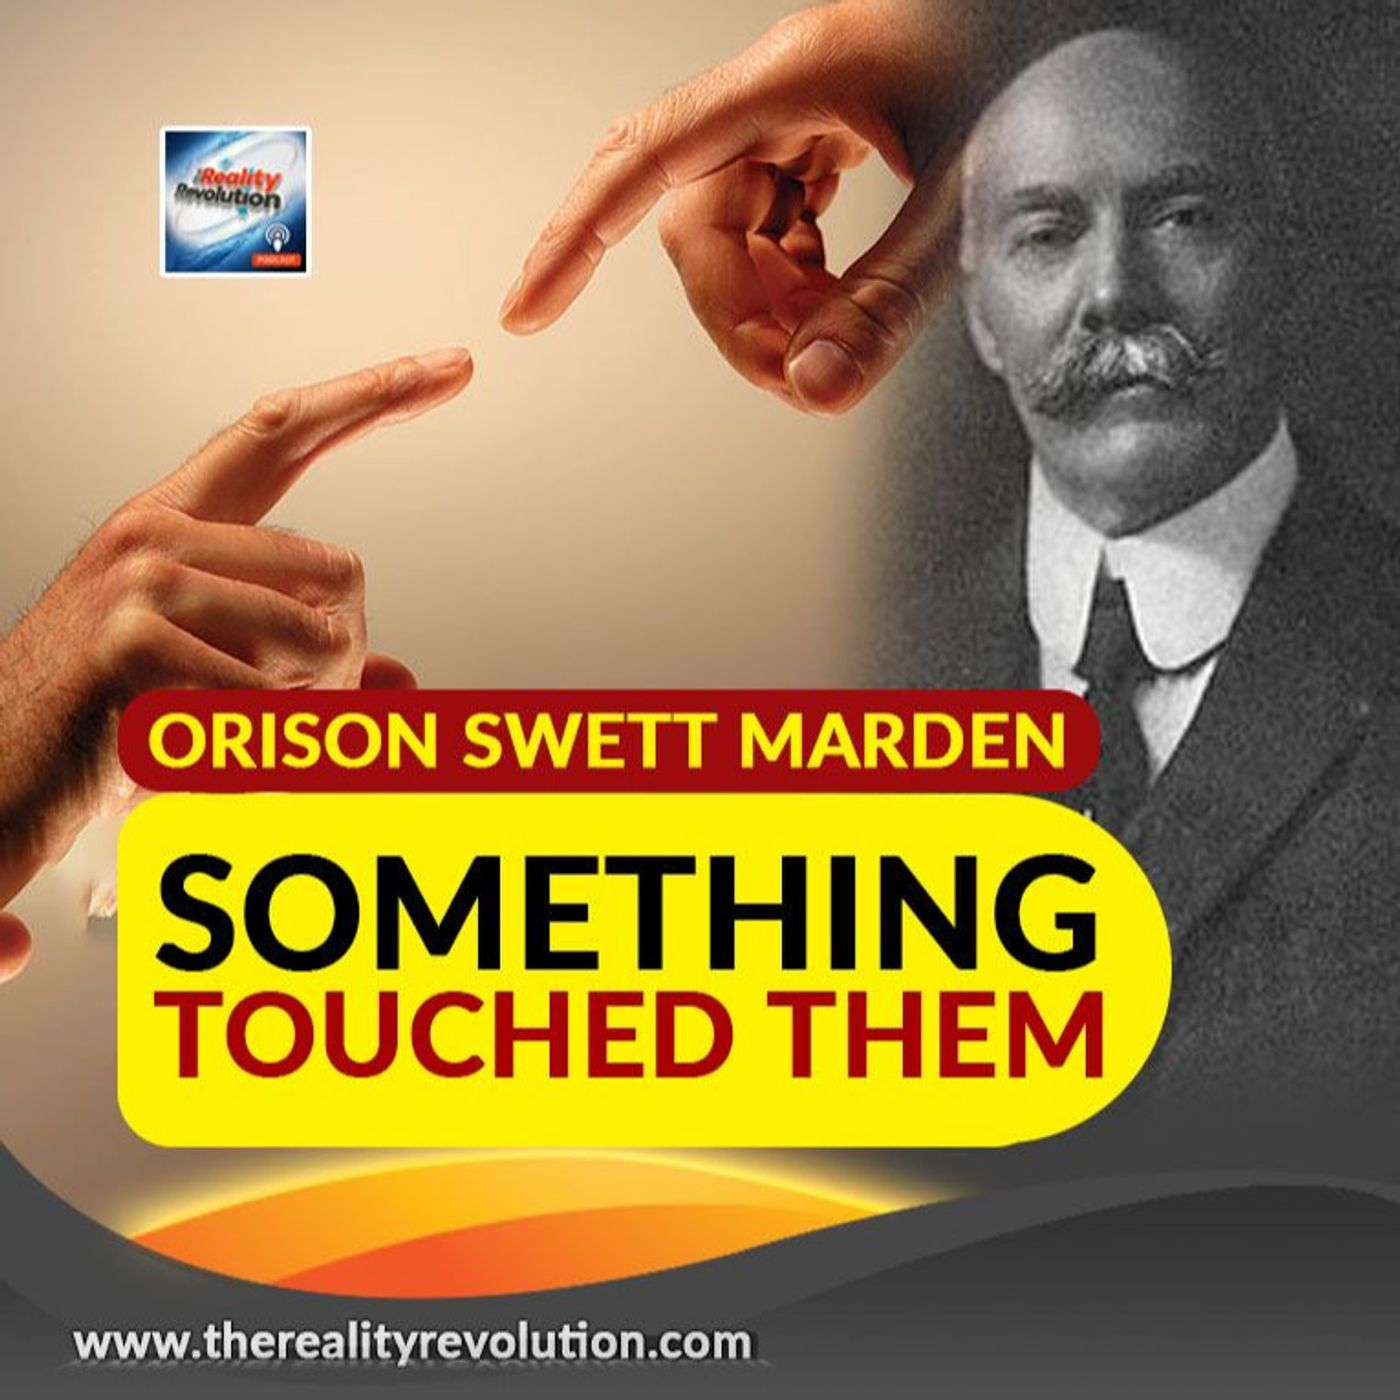 Orison Swett Marden Something Touched Them